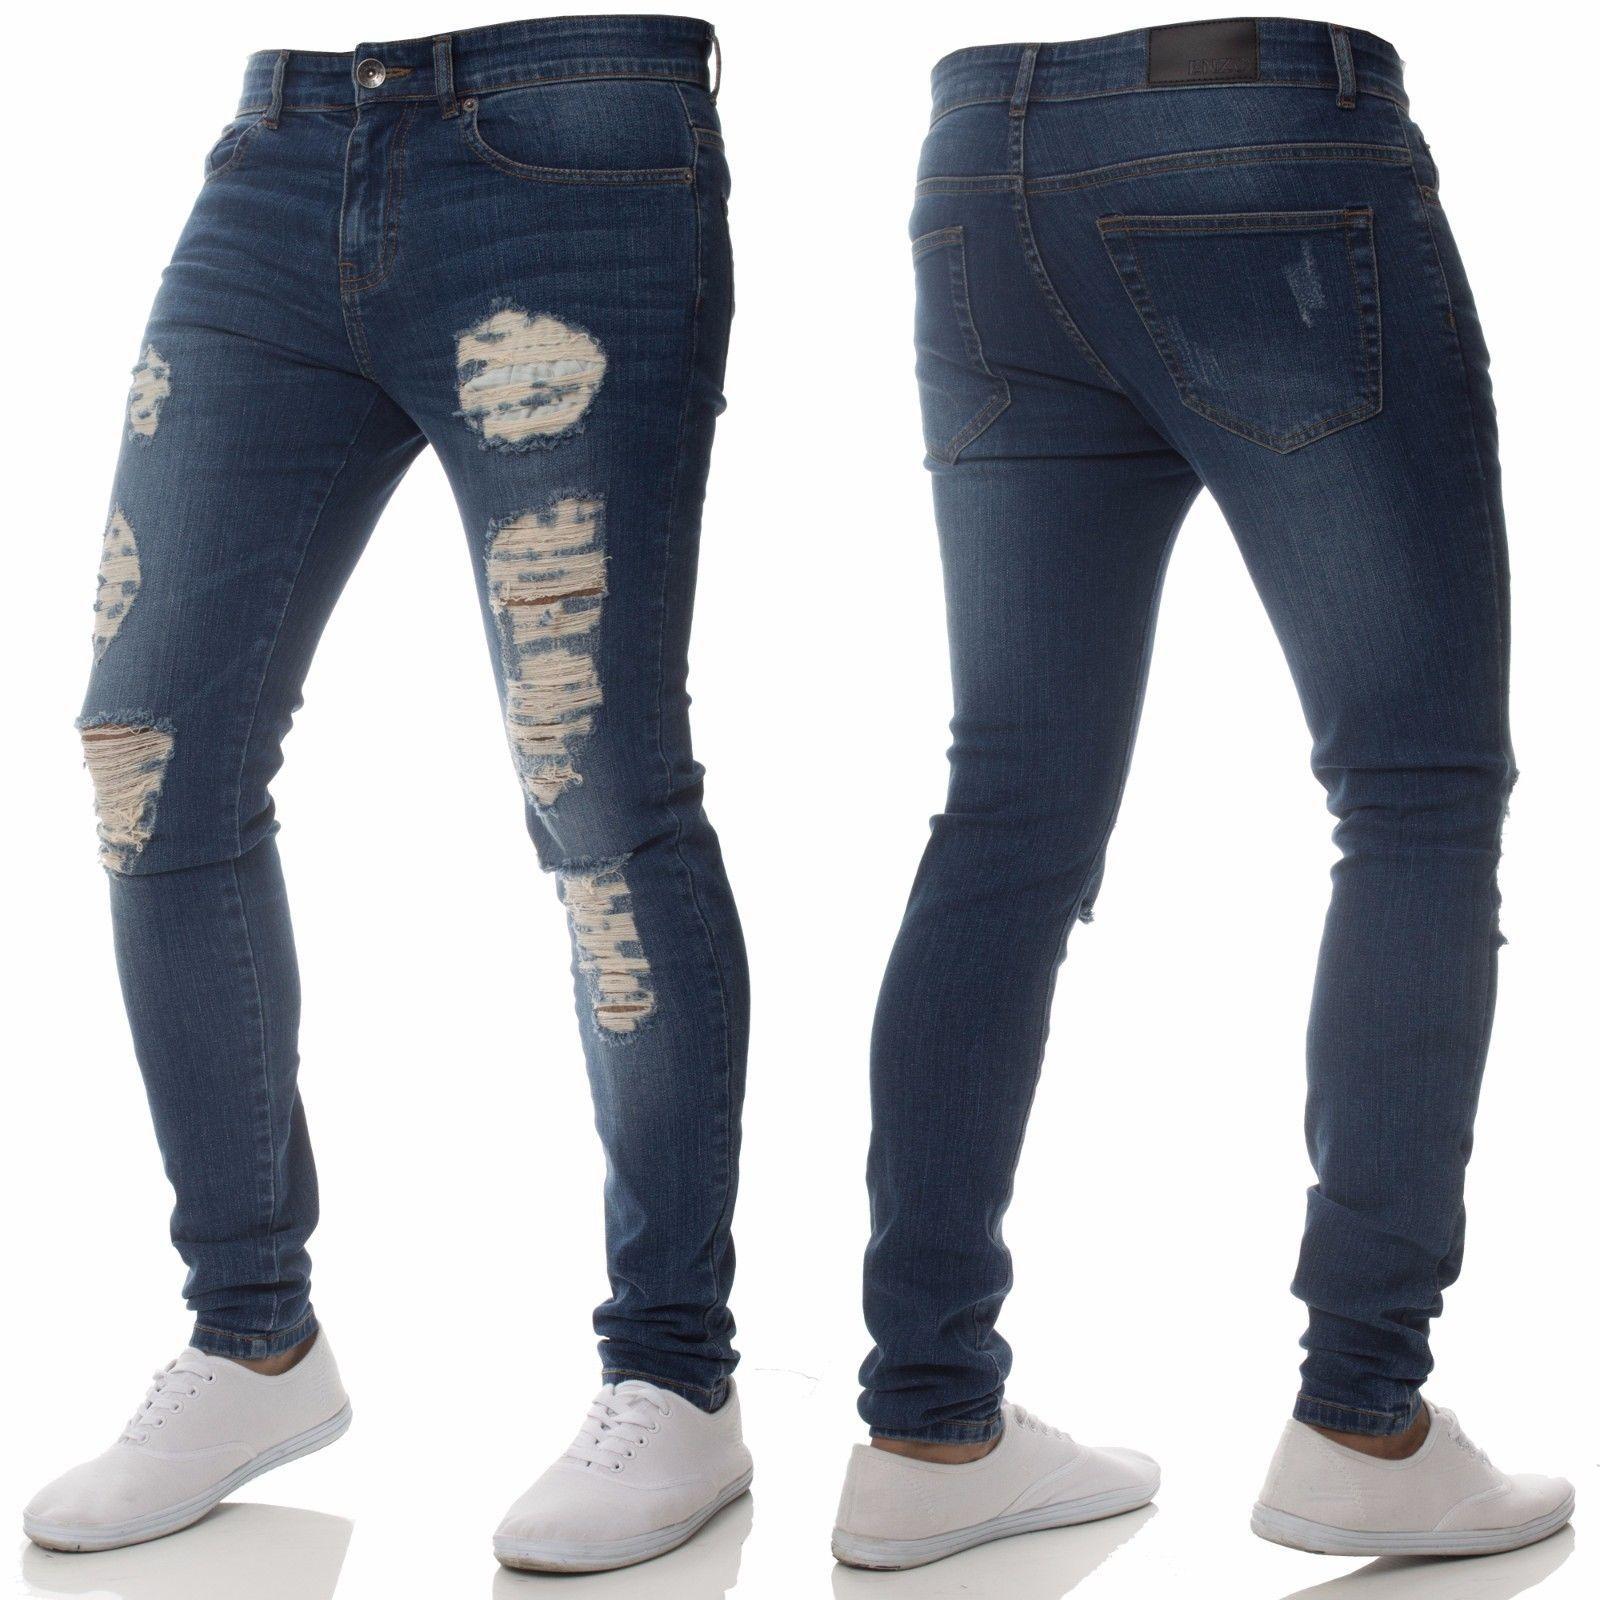 Hole Street Denim Jean Fashion Skinny High Waist Men Side Stripe 80s Pant Slim Pencil Brade Stripe Ripped Elastic Jeans Big Size